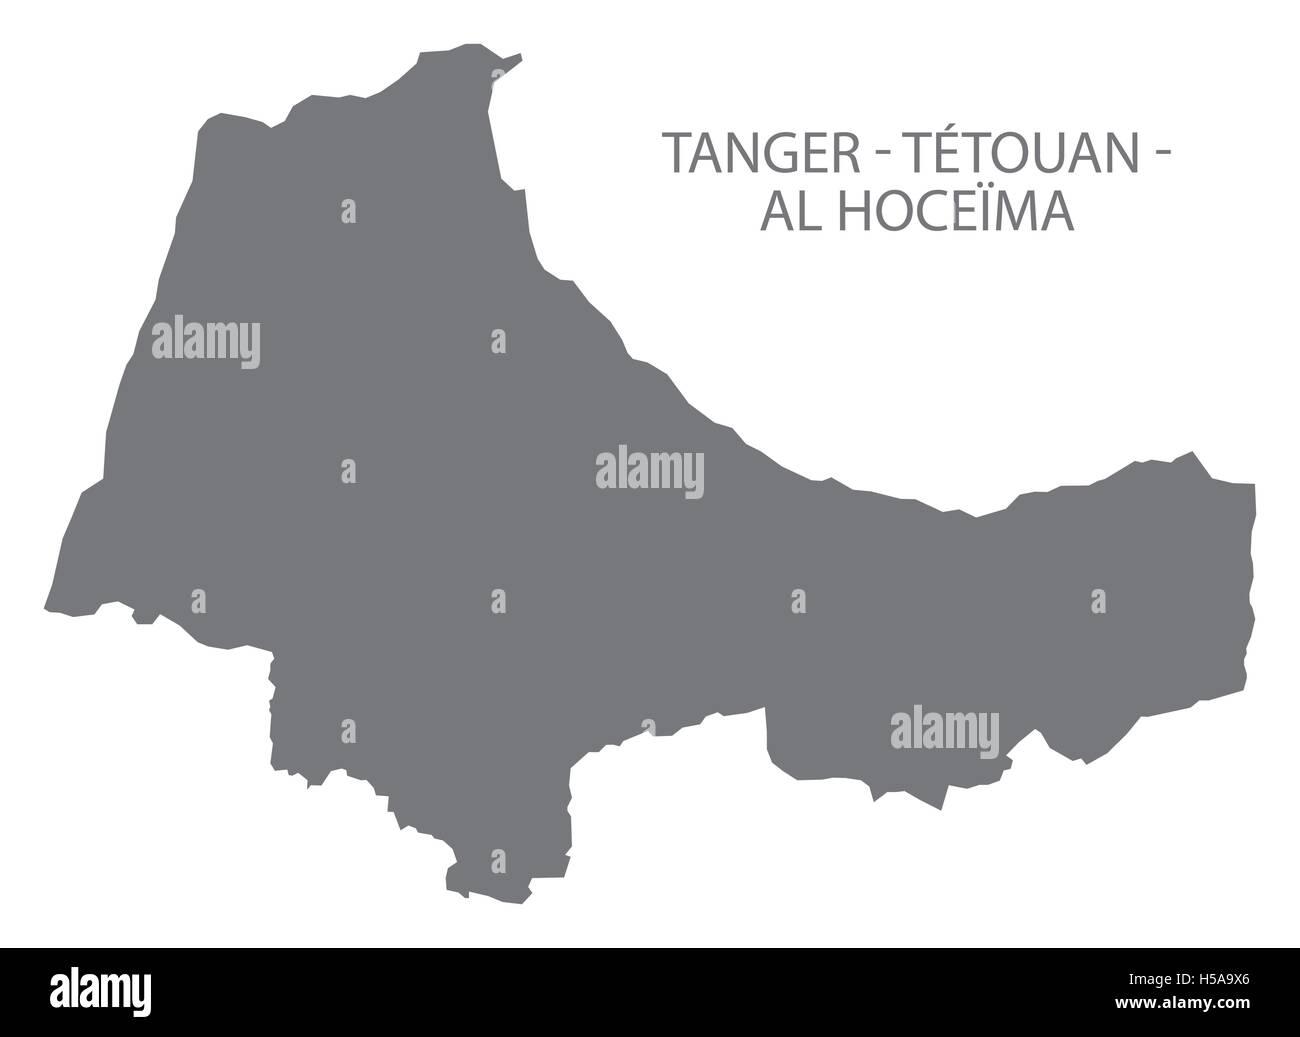 Tanger Tetouan Al Hoceima Morocco Map grey Stock Vector Art